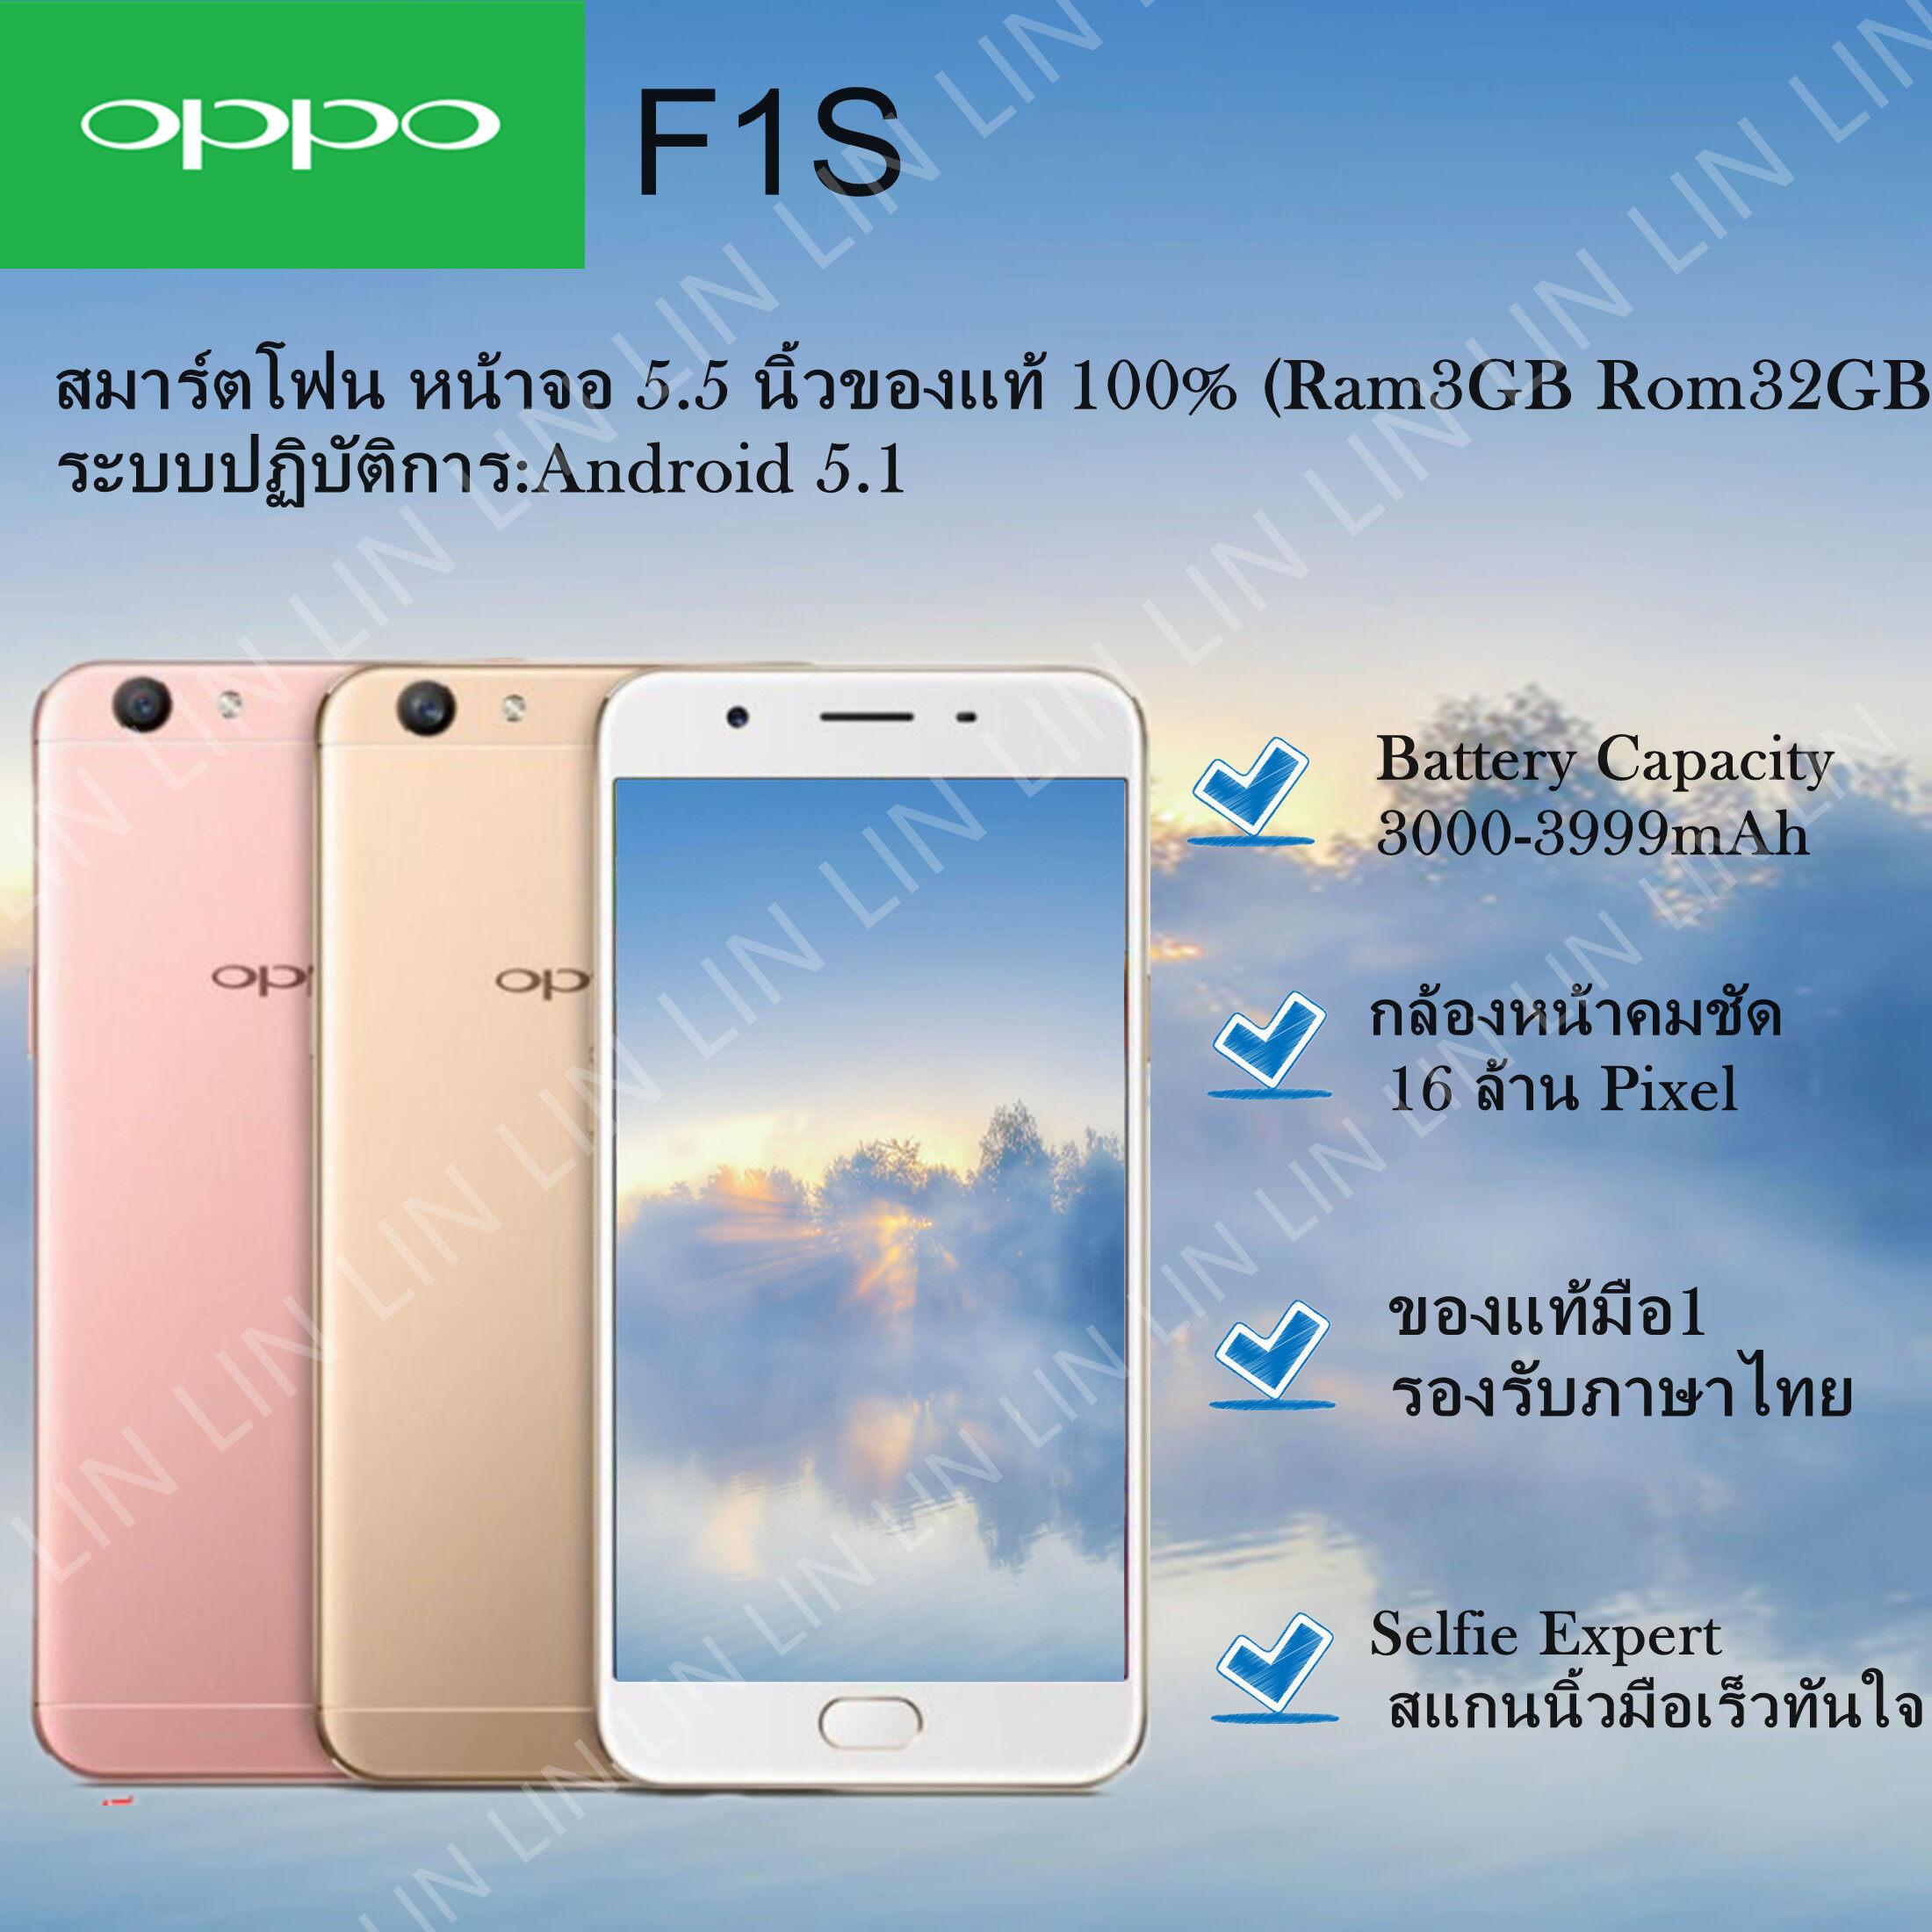 Oppo F1s ของแท้100% มือ1 เครื่องใหม่ Ram3GB Rom32GB  กล้องหน้าคมชัด   (พร้อมส่ง)